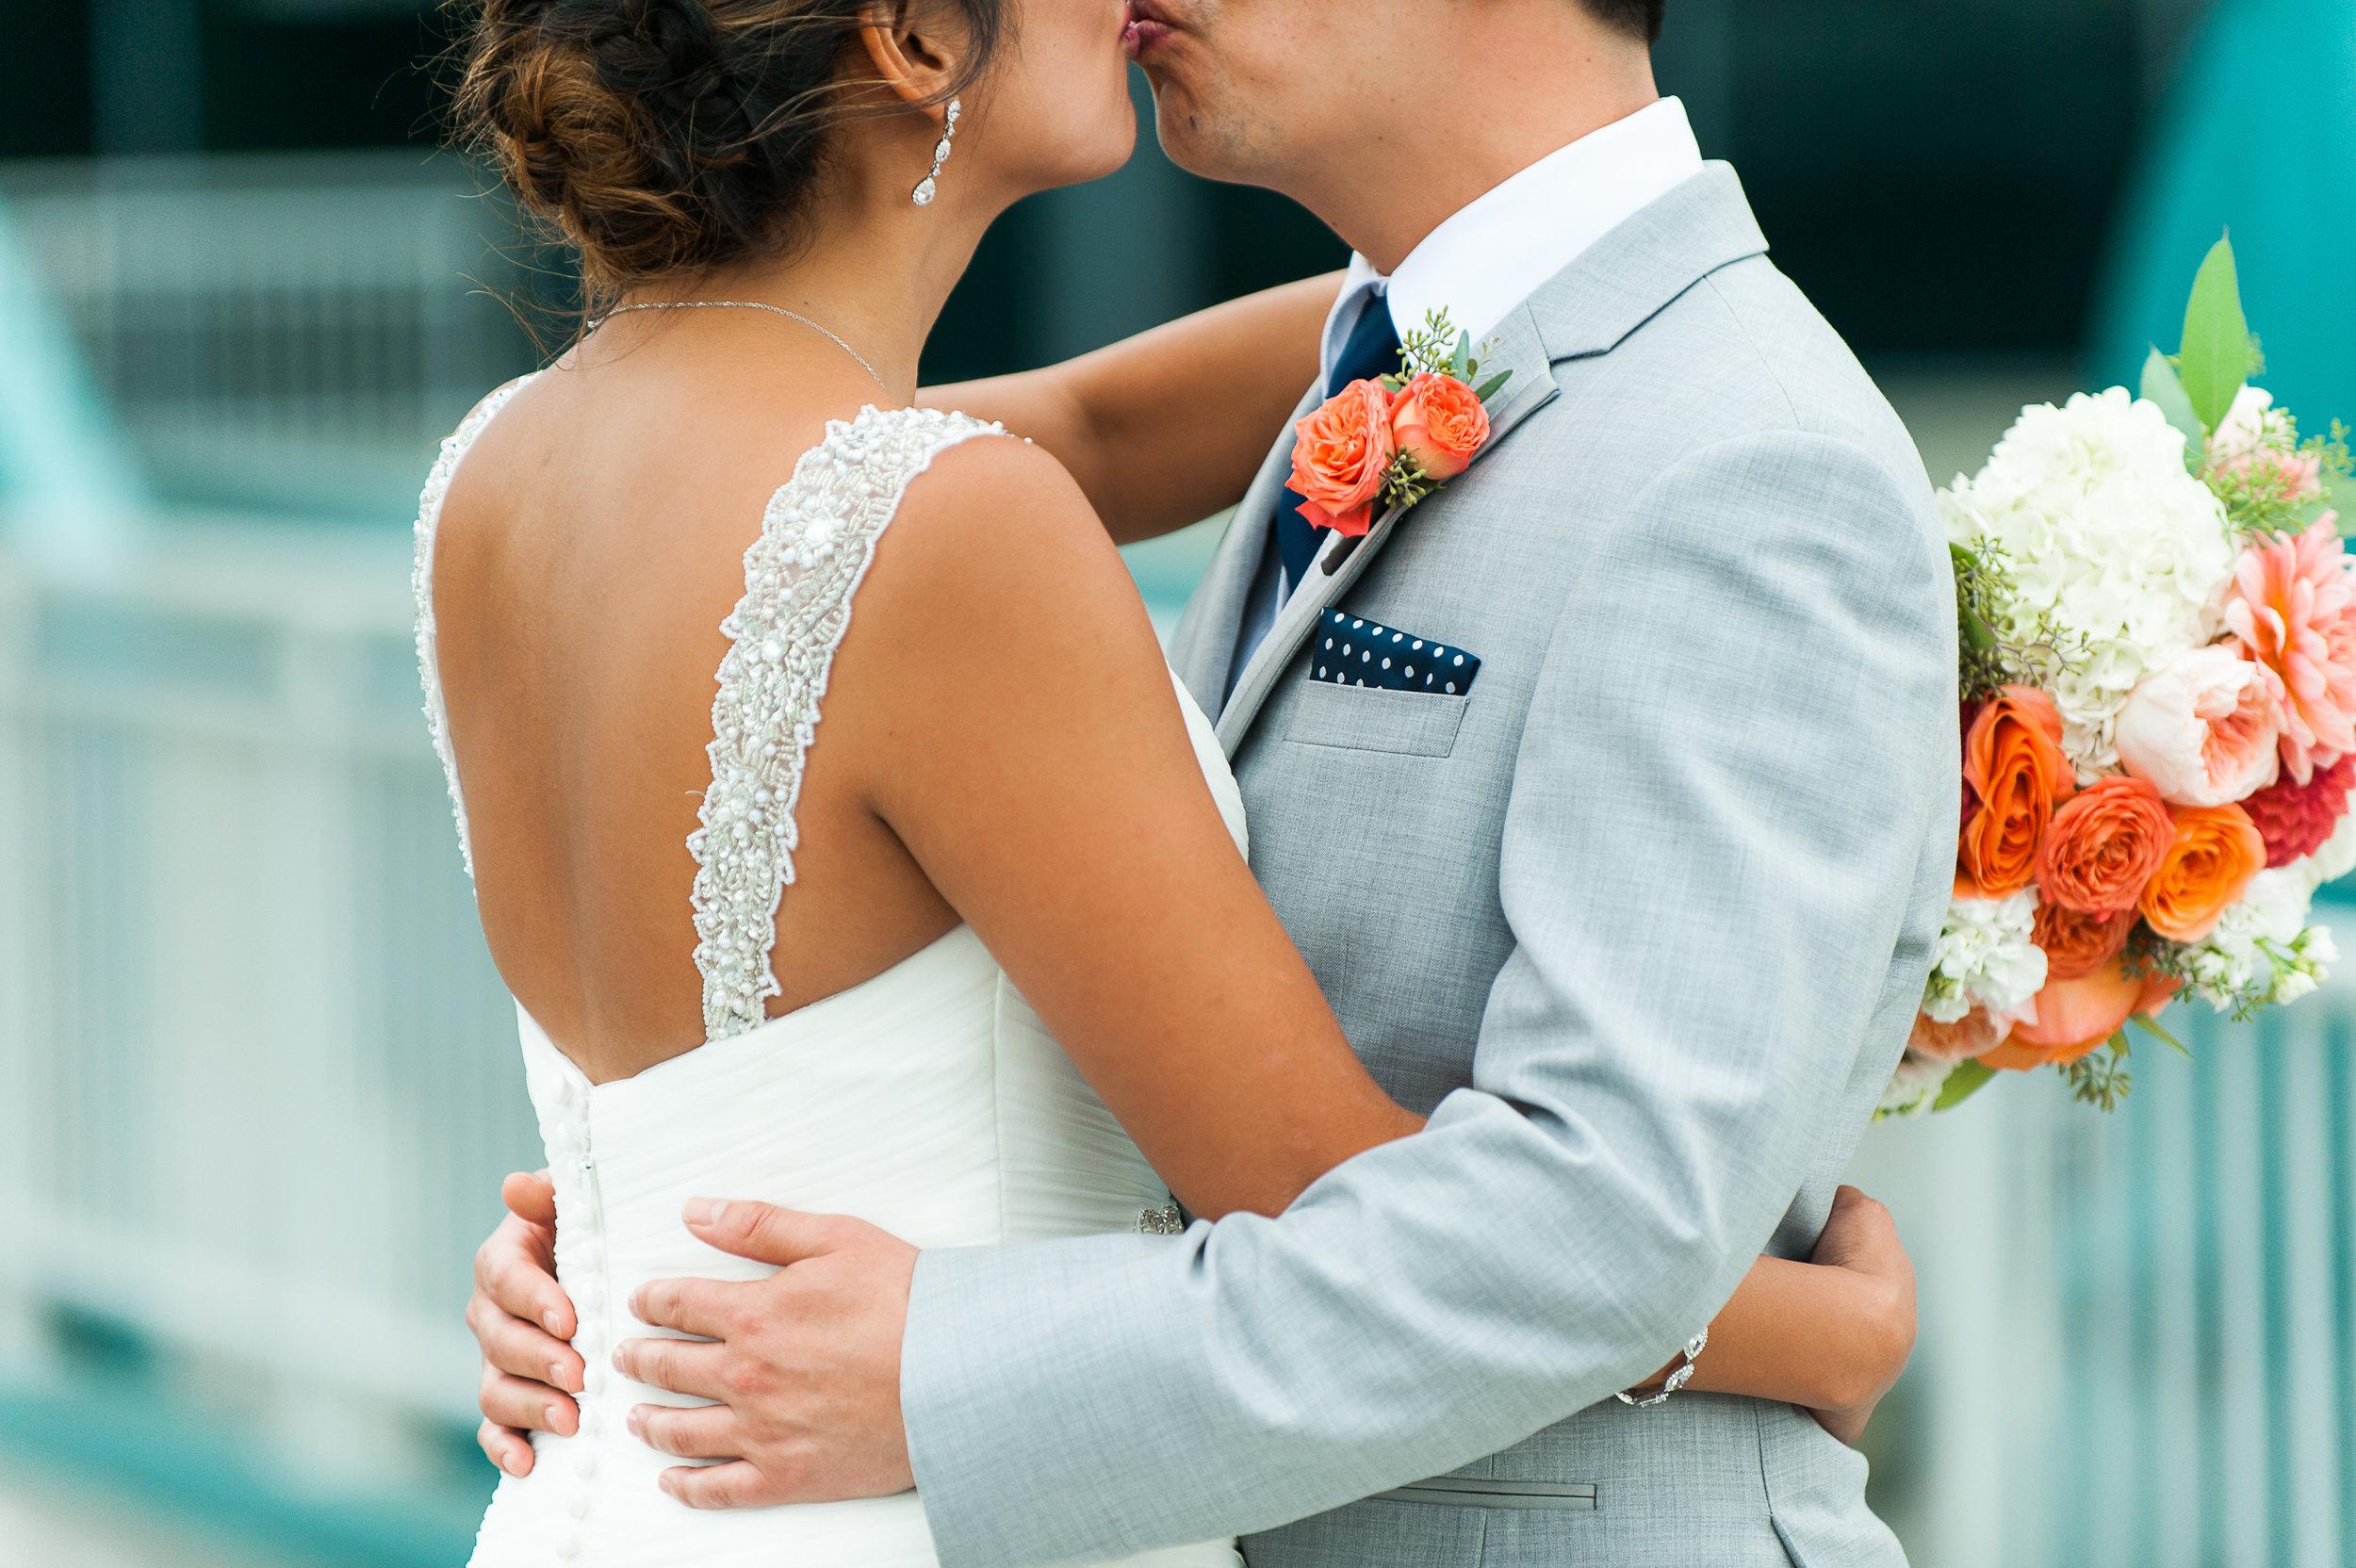 DJ-wedding-Van-Wyhe-Photography-117.jpg